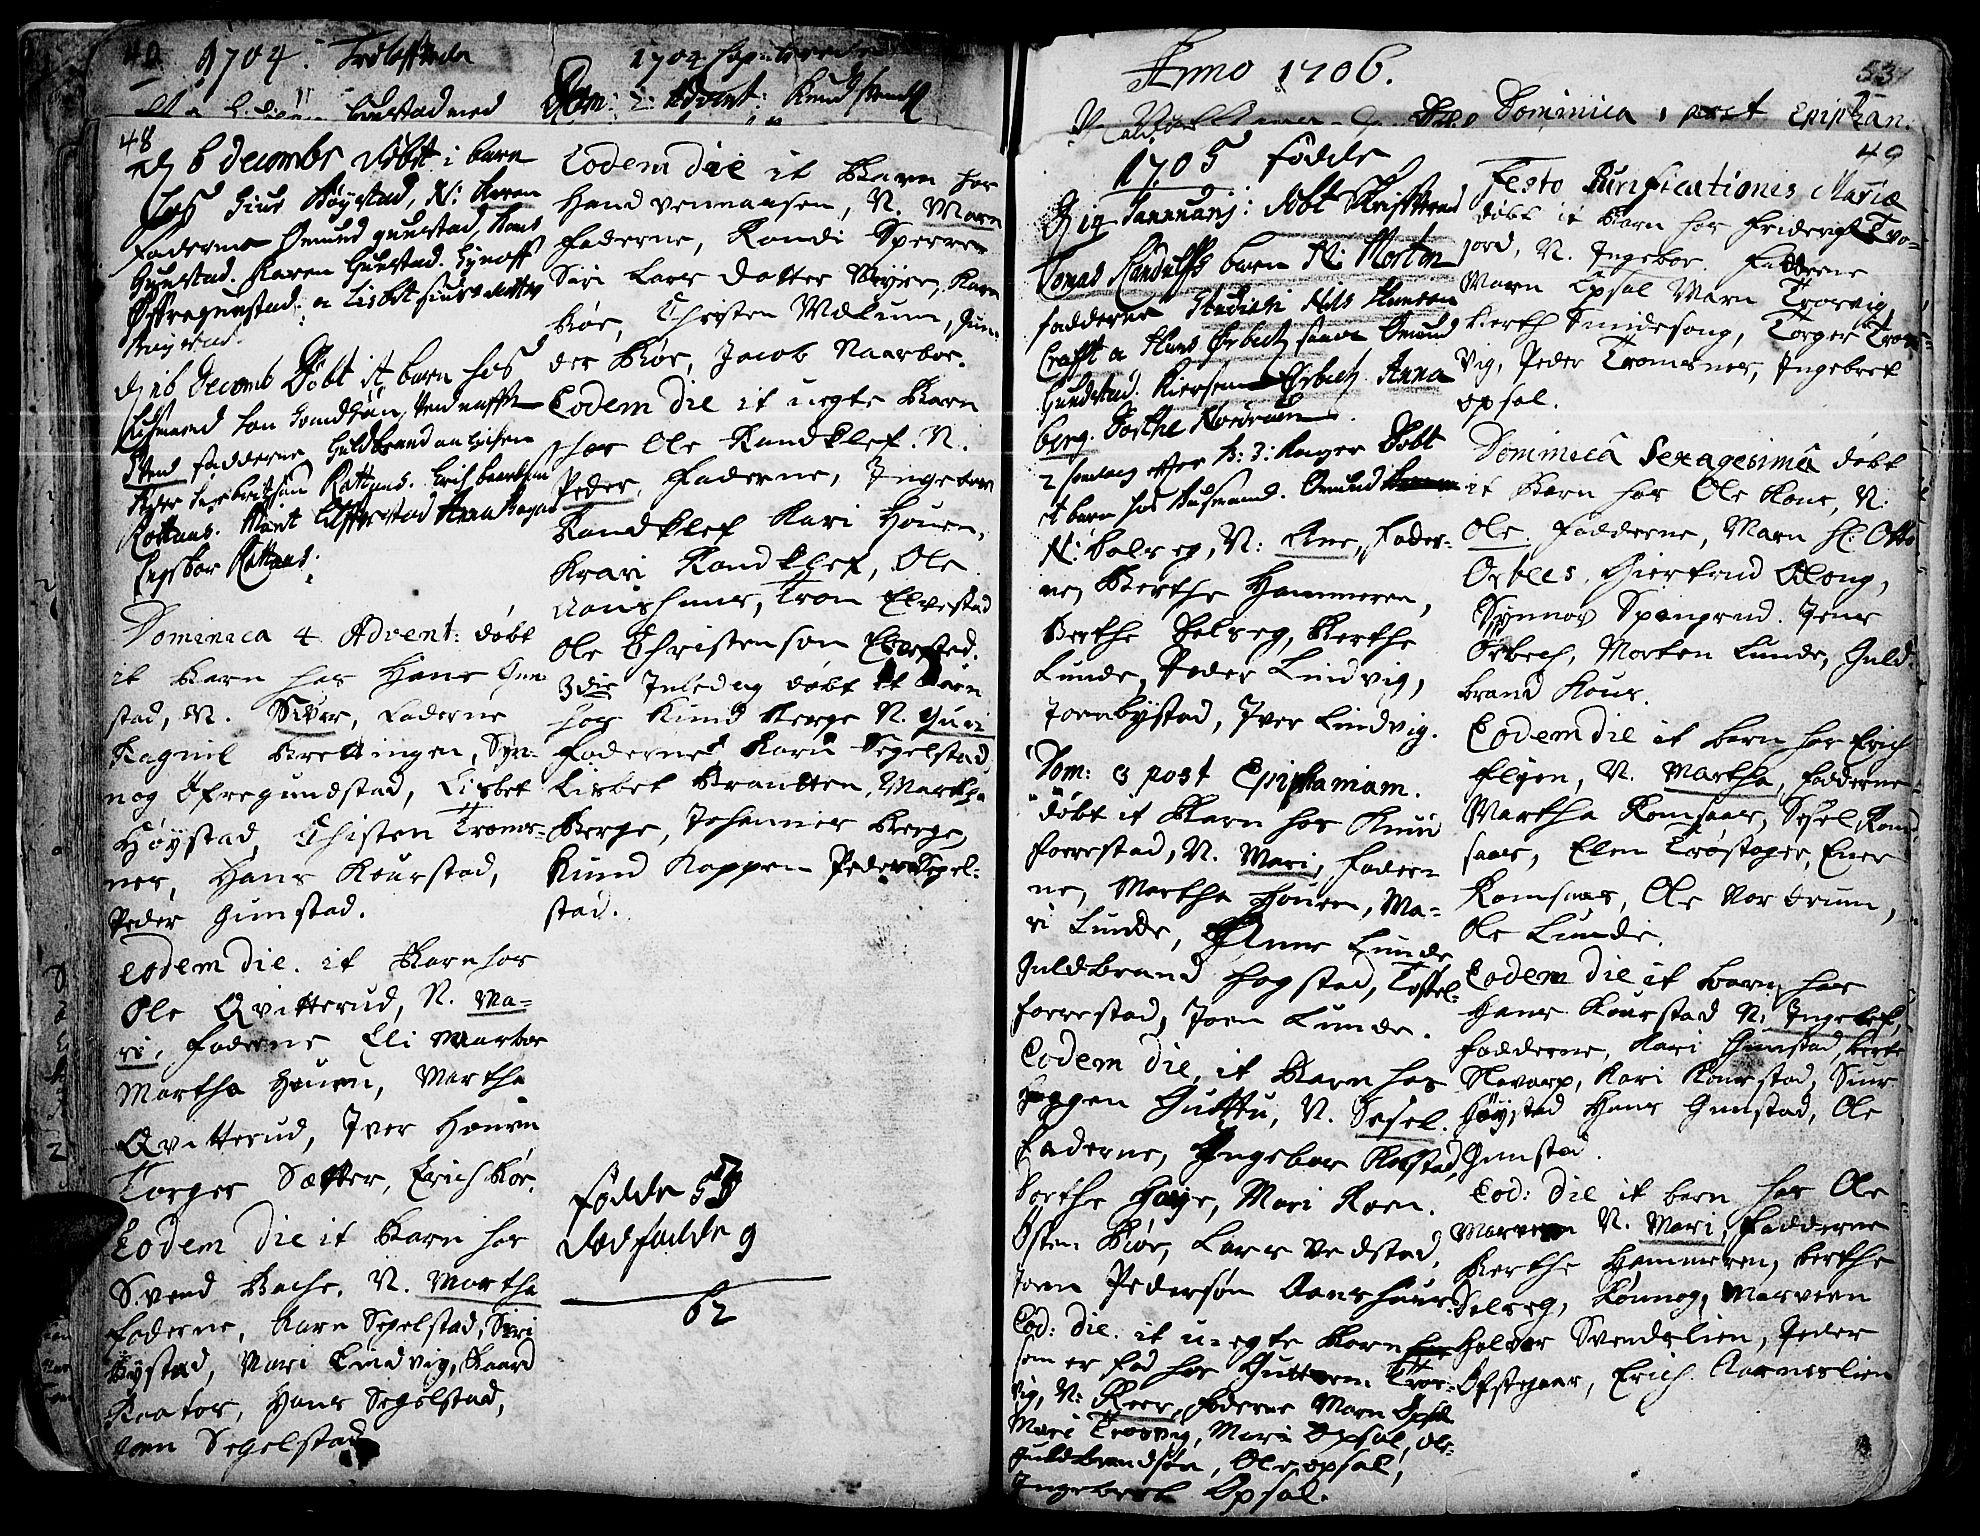 SAH, Ringebu prestekontor, Ministerialbok nr. 1, 1696-1733, s. 48-49